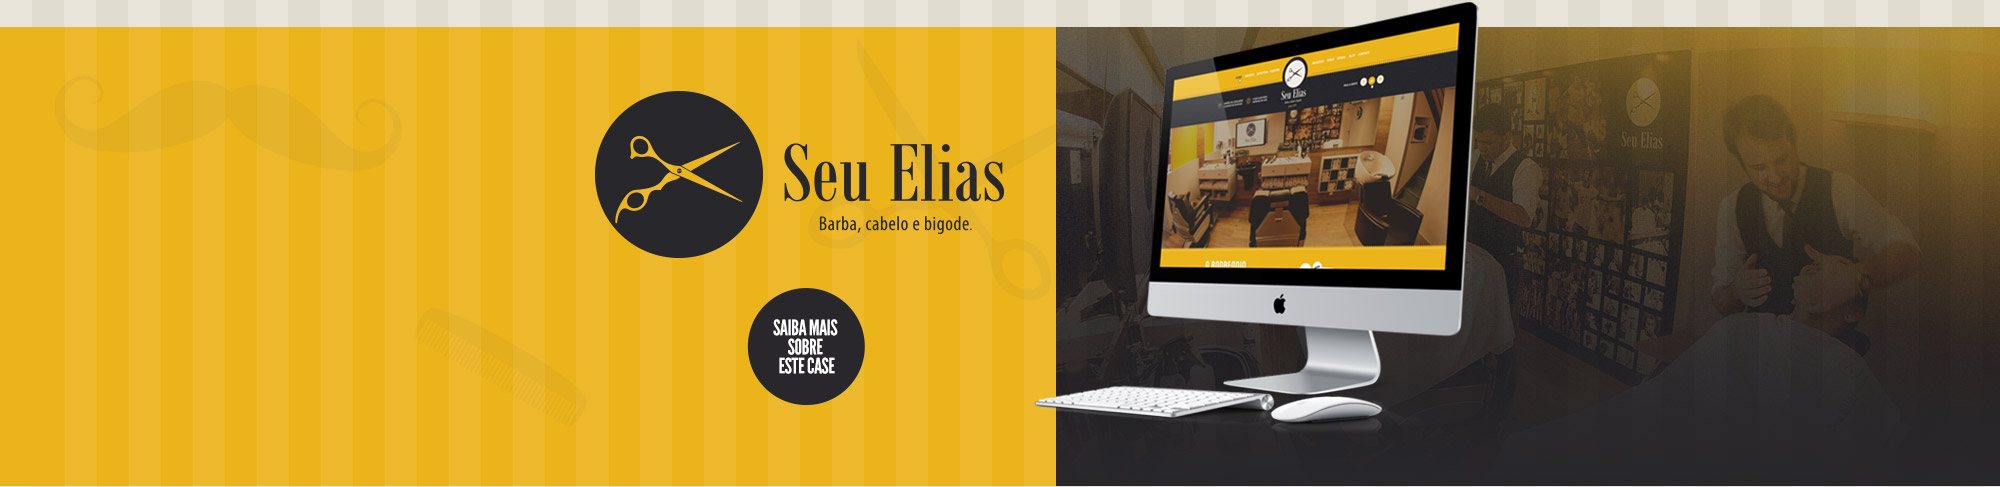 banner-site-quartel-seuelias